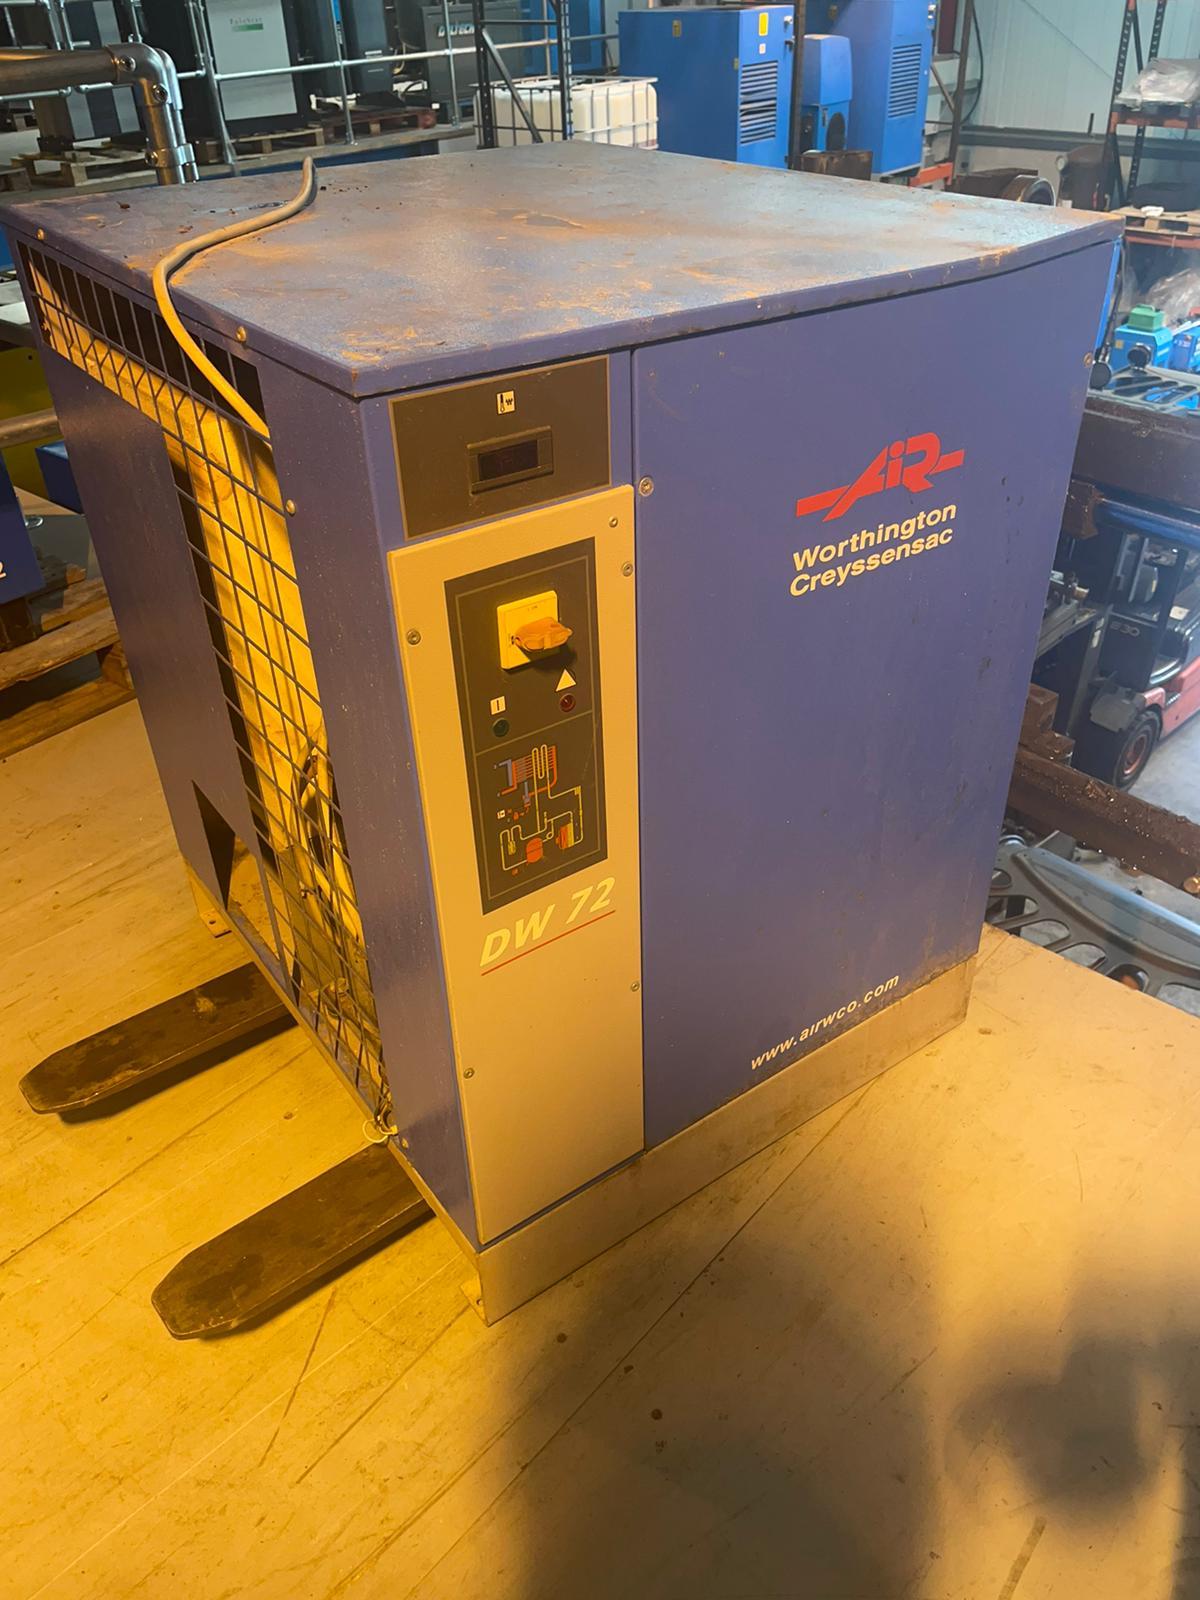 Worhtington DW72 424cfm refrigerant air dryer